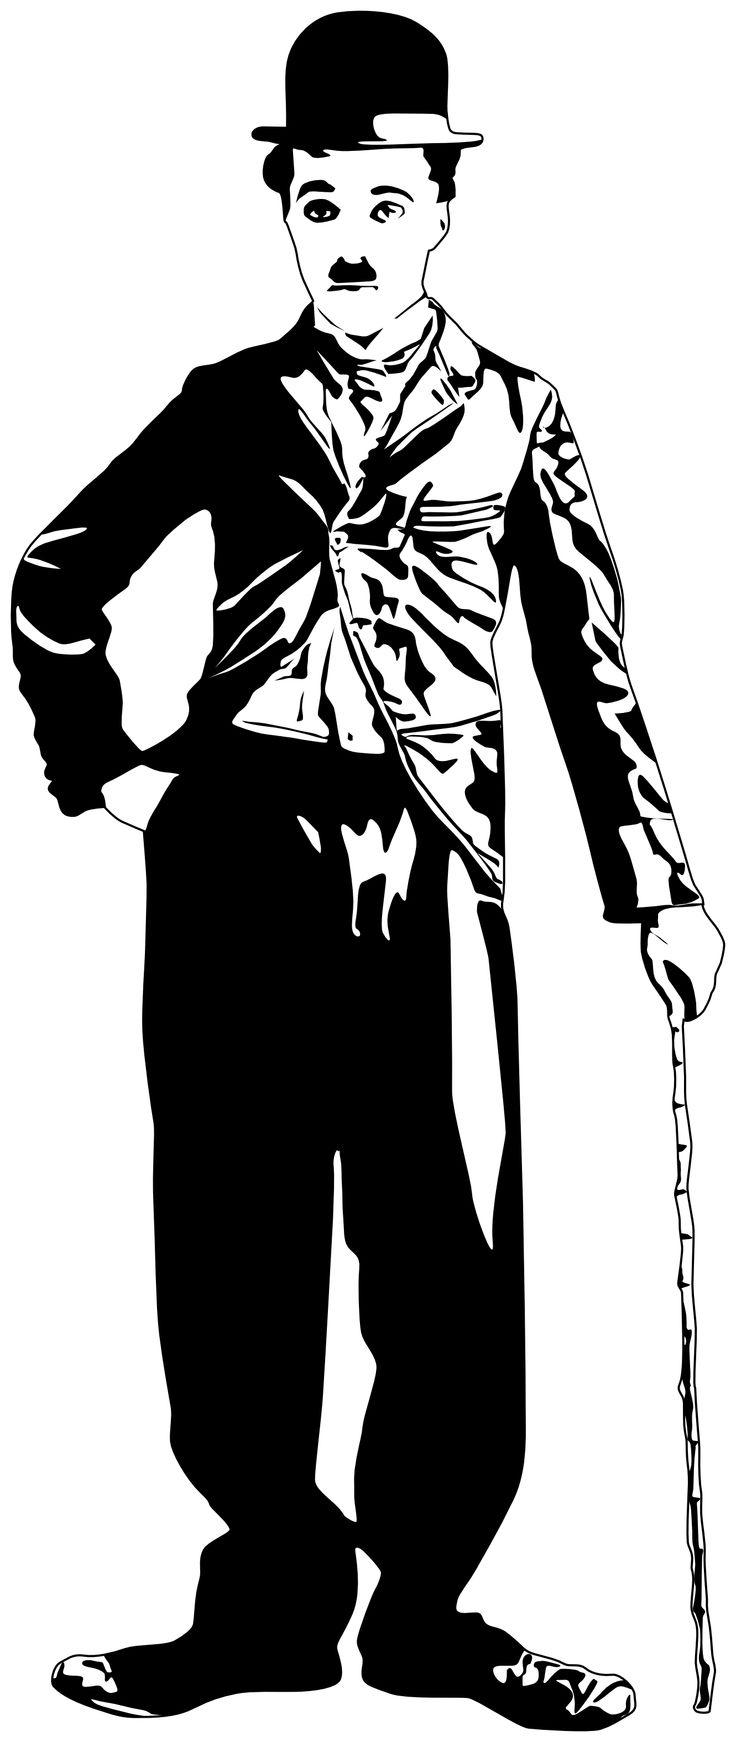 Chaplin Silhouette